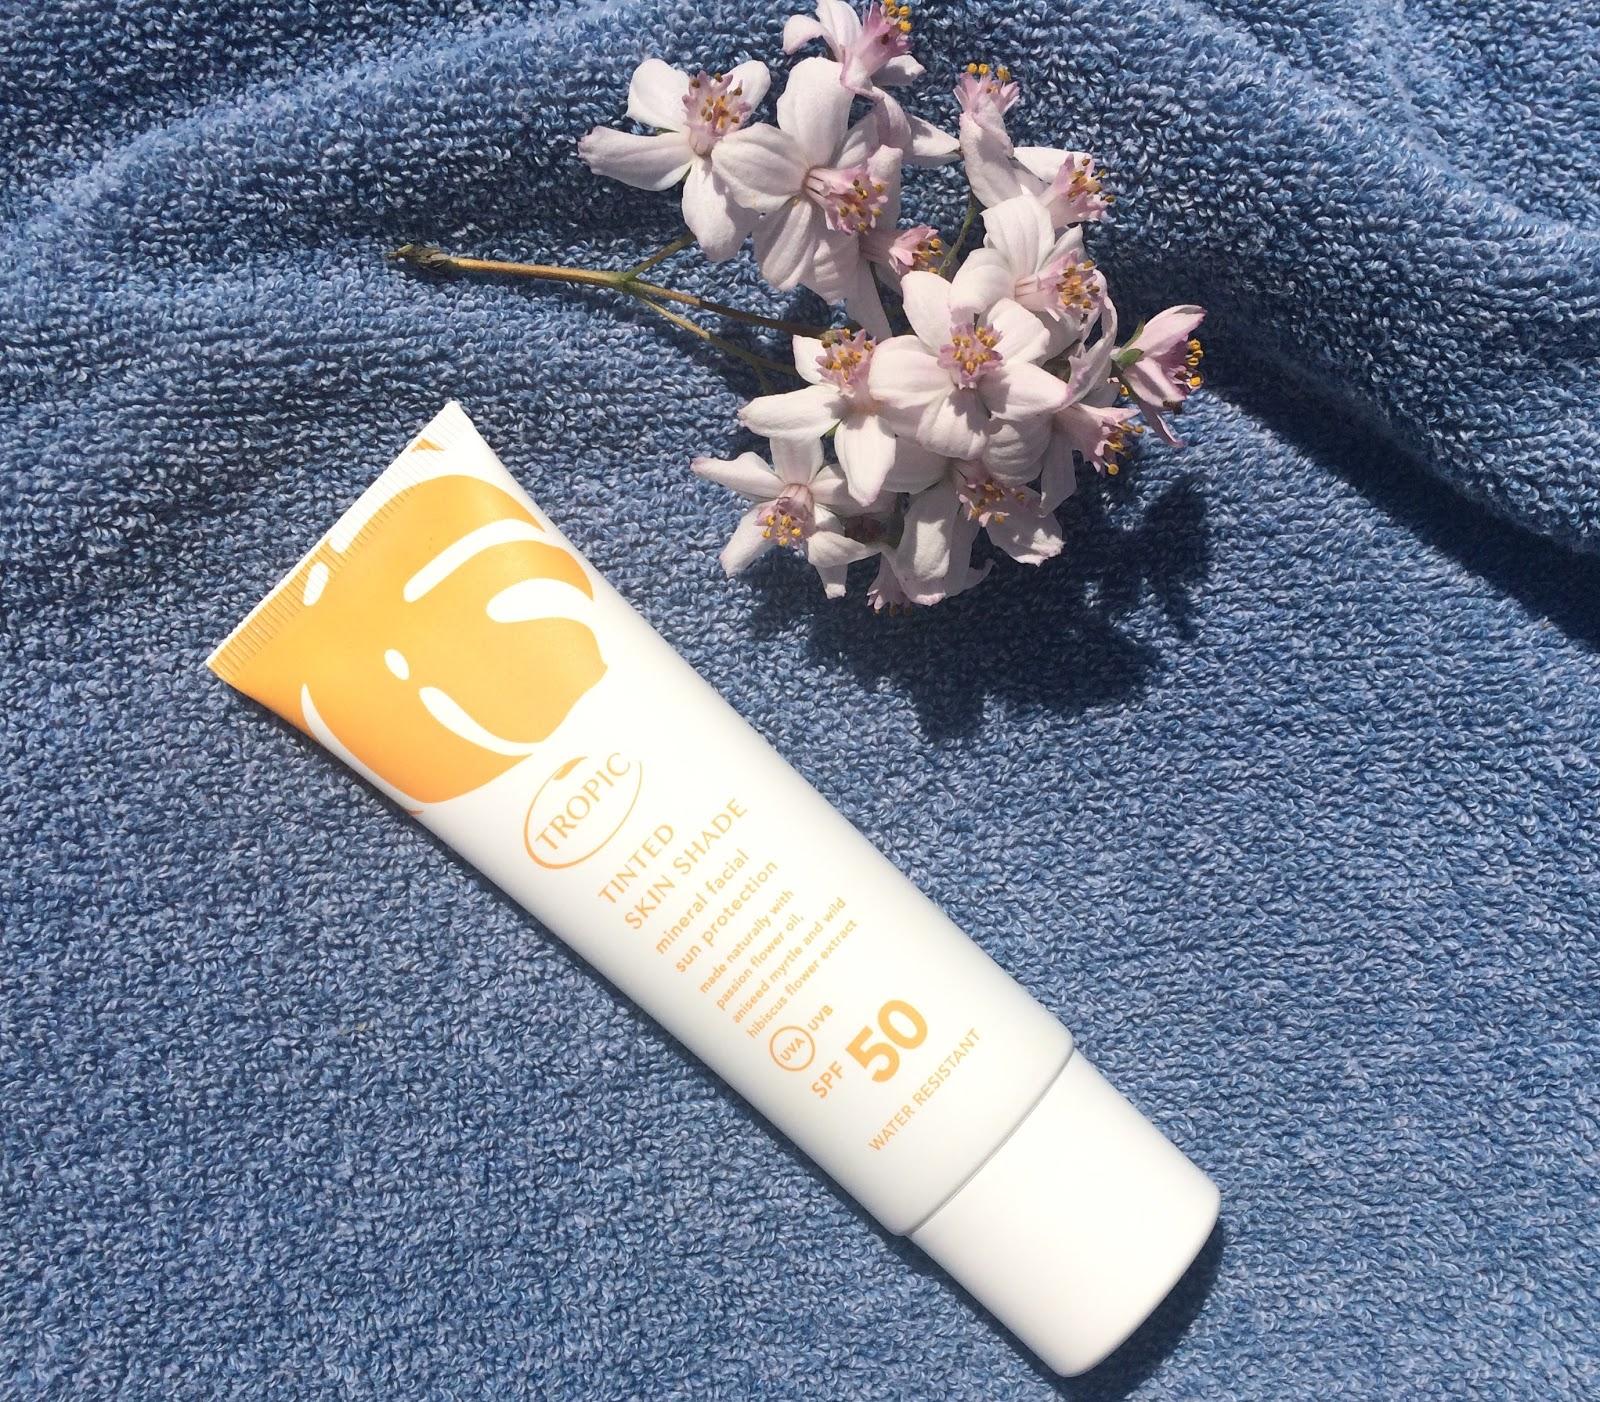 Tropic Skin Care Tinted Skin Shade